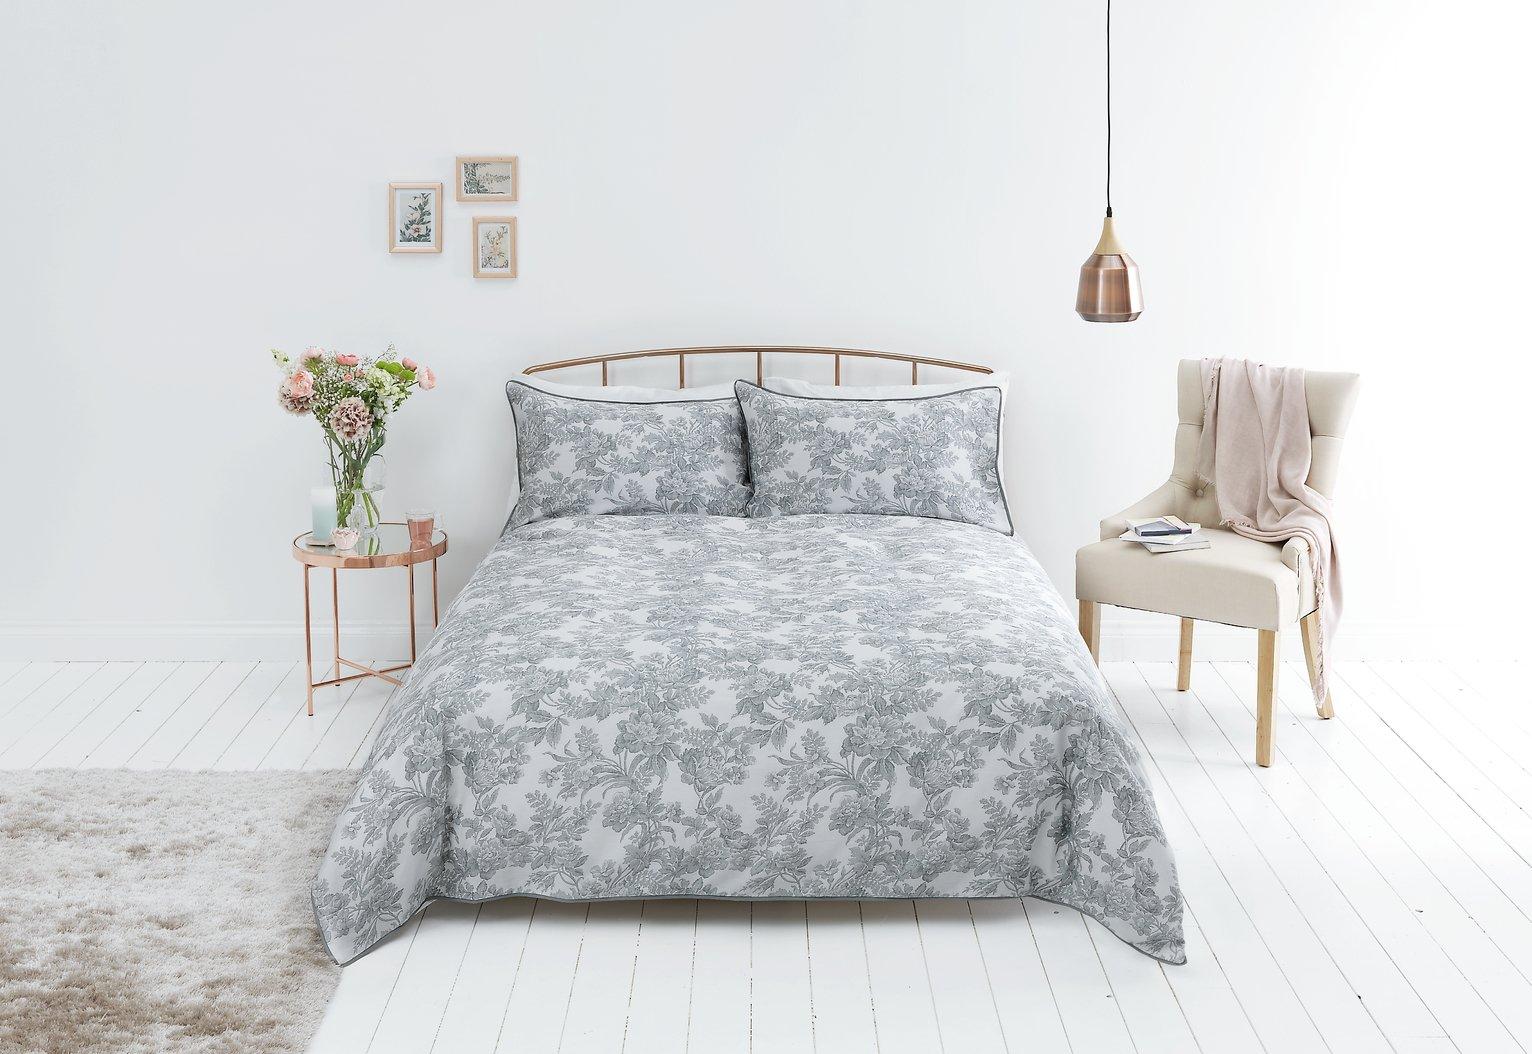 Sainsbury's Home Parisan Maison Grey Bedding Set - Double